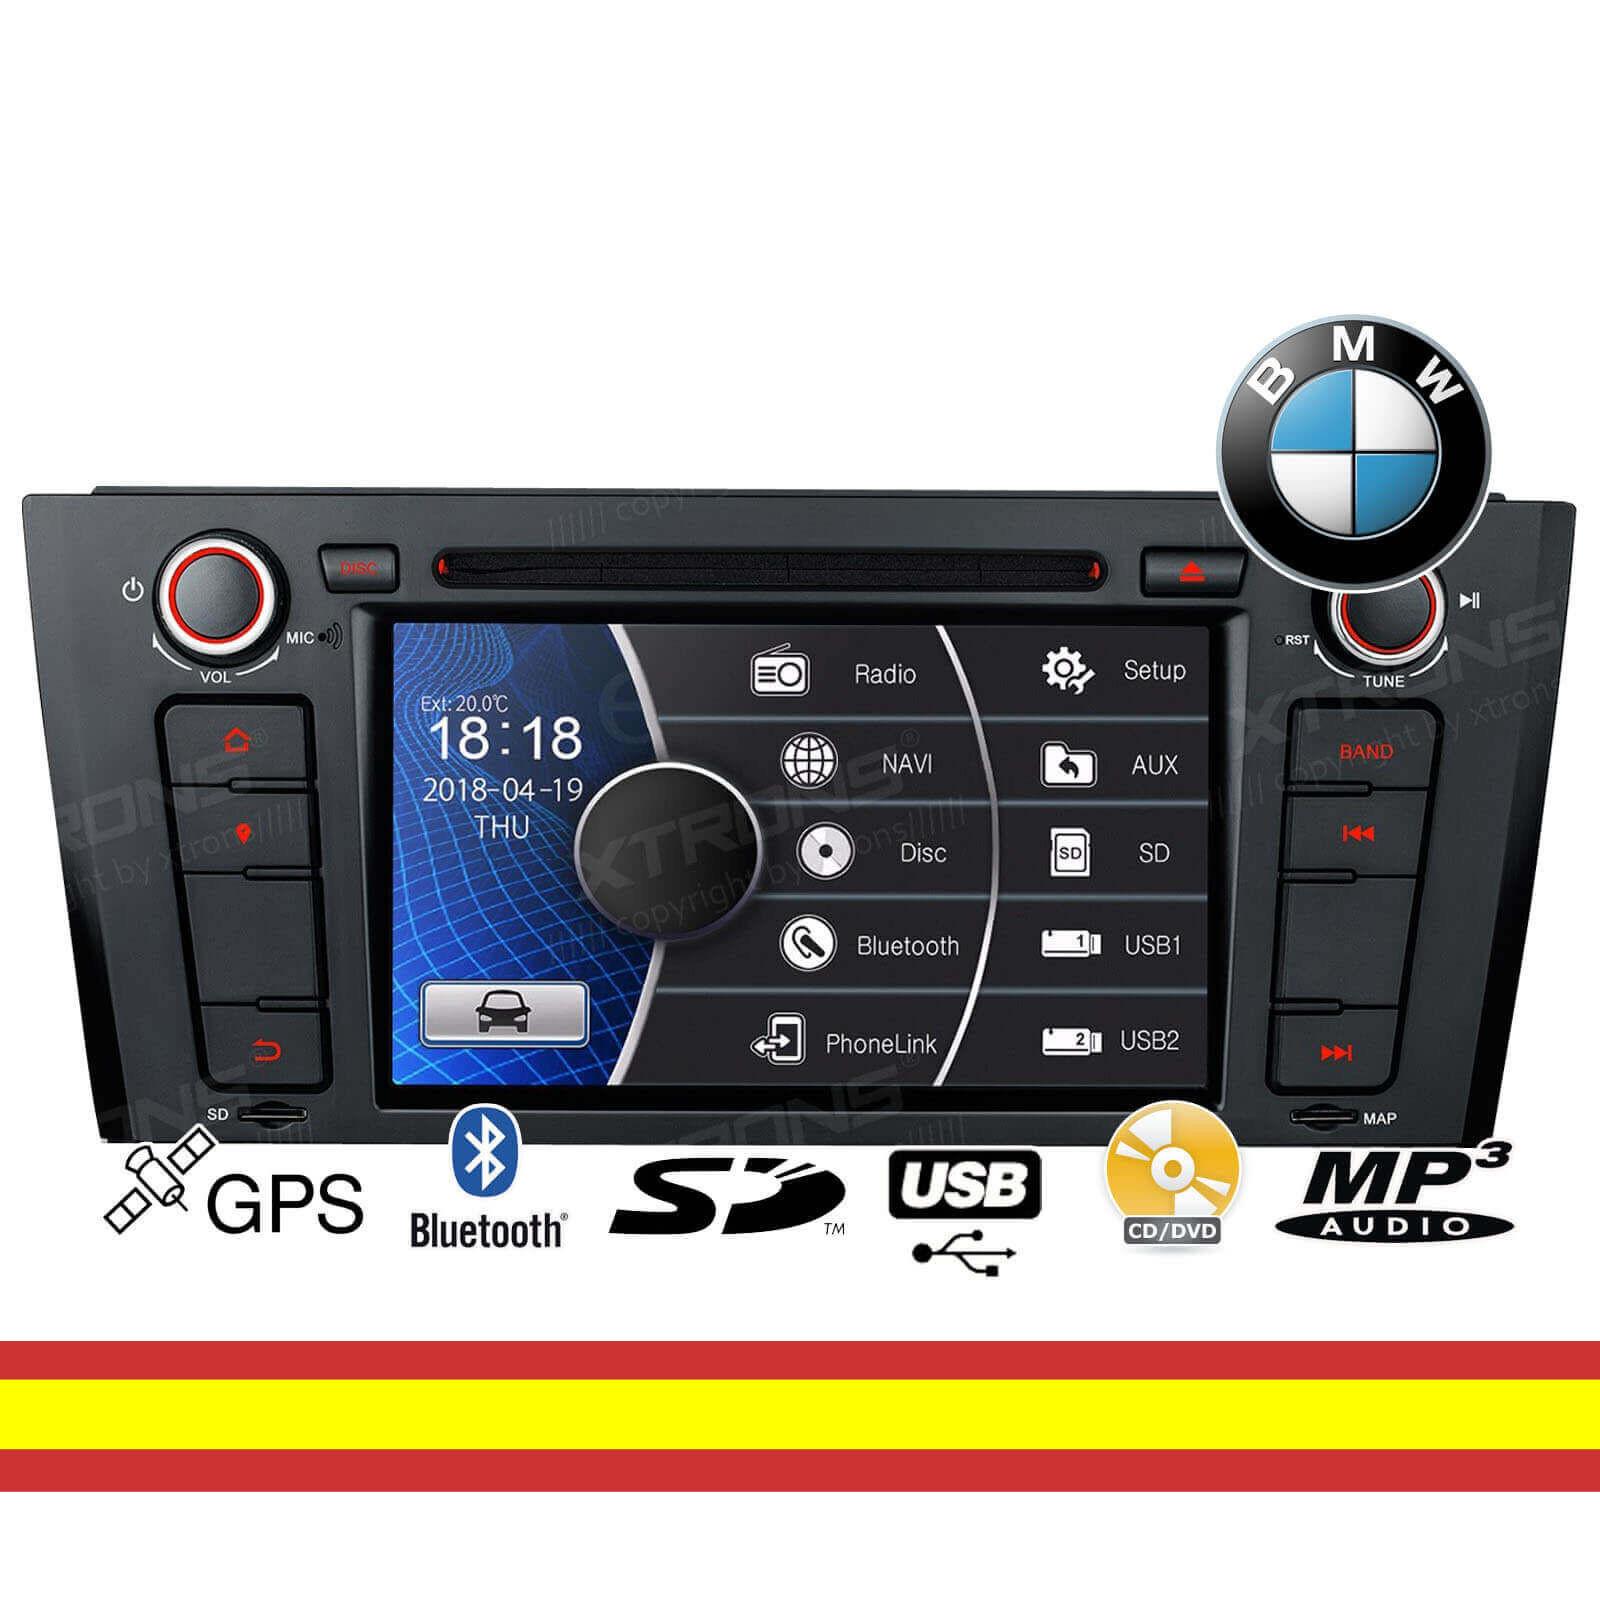 s l1600 - Radio CD DVD para BMW E81 E82 E88 Car Audio GPS Multimedia Bluetooth Mirroring